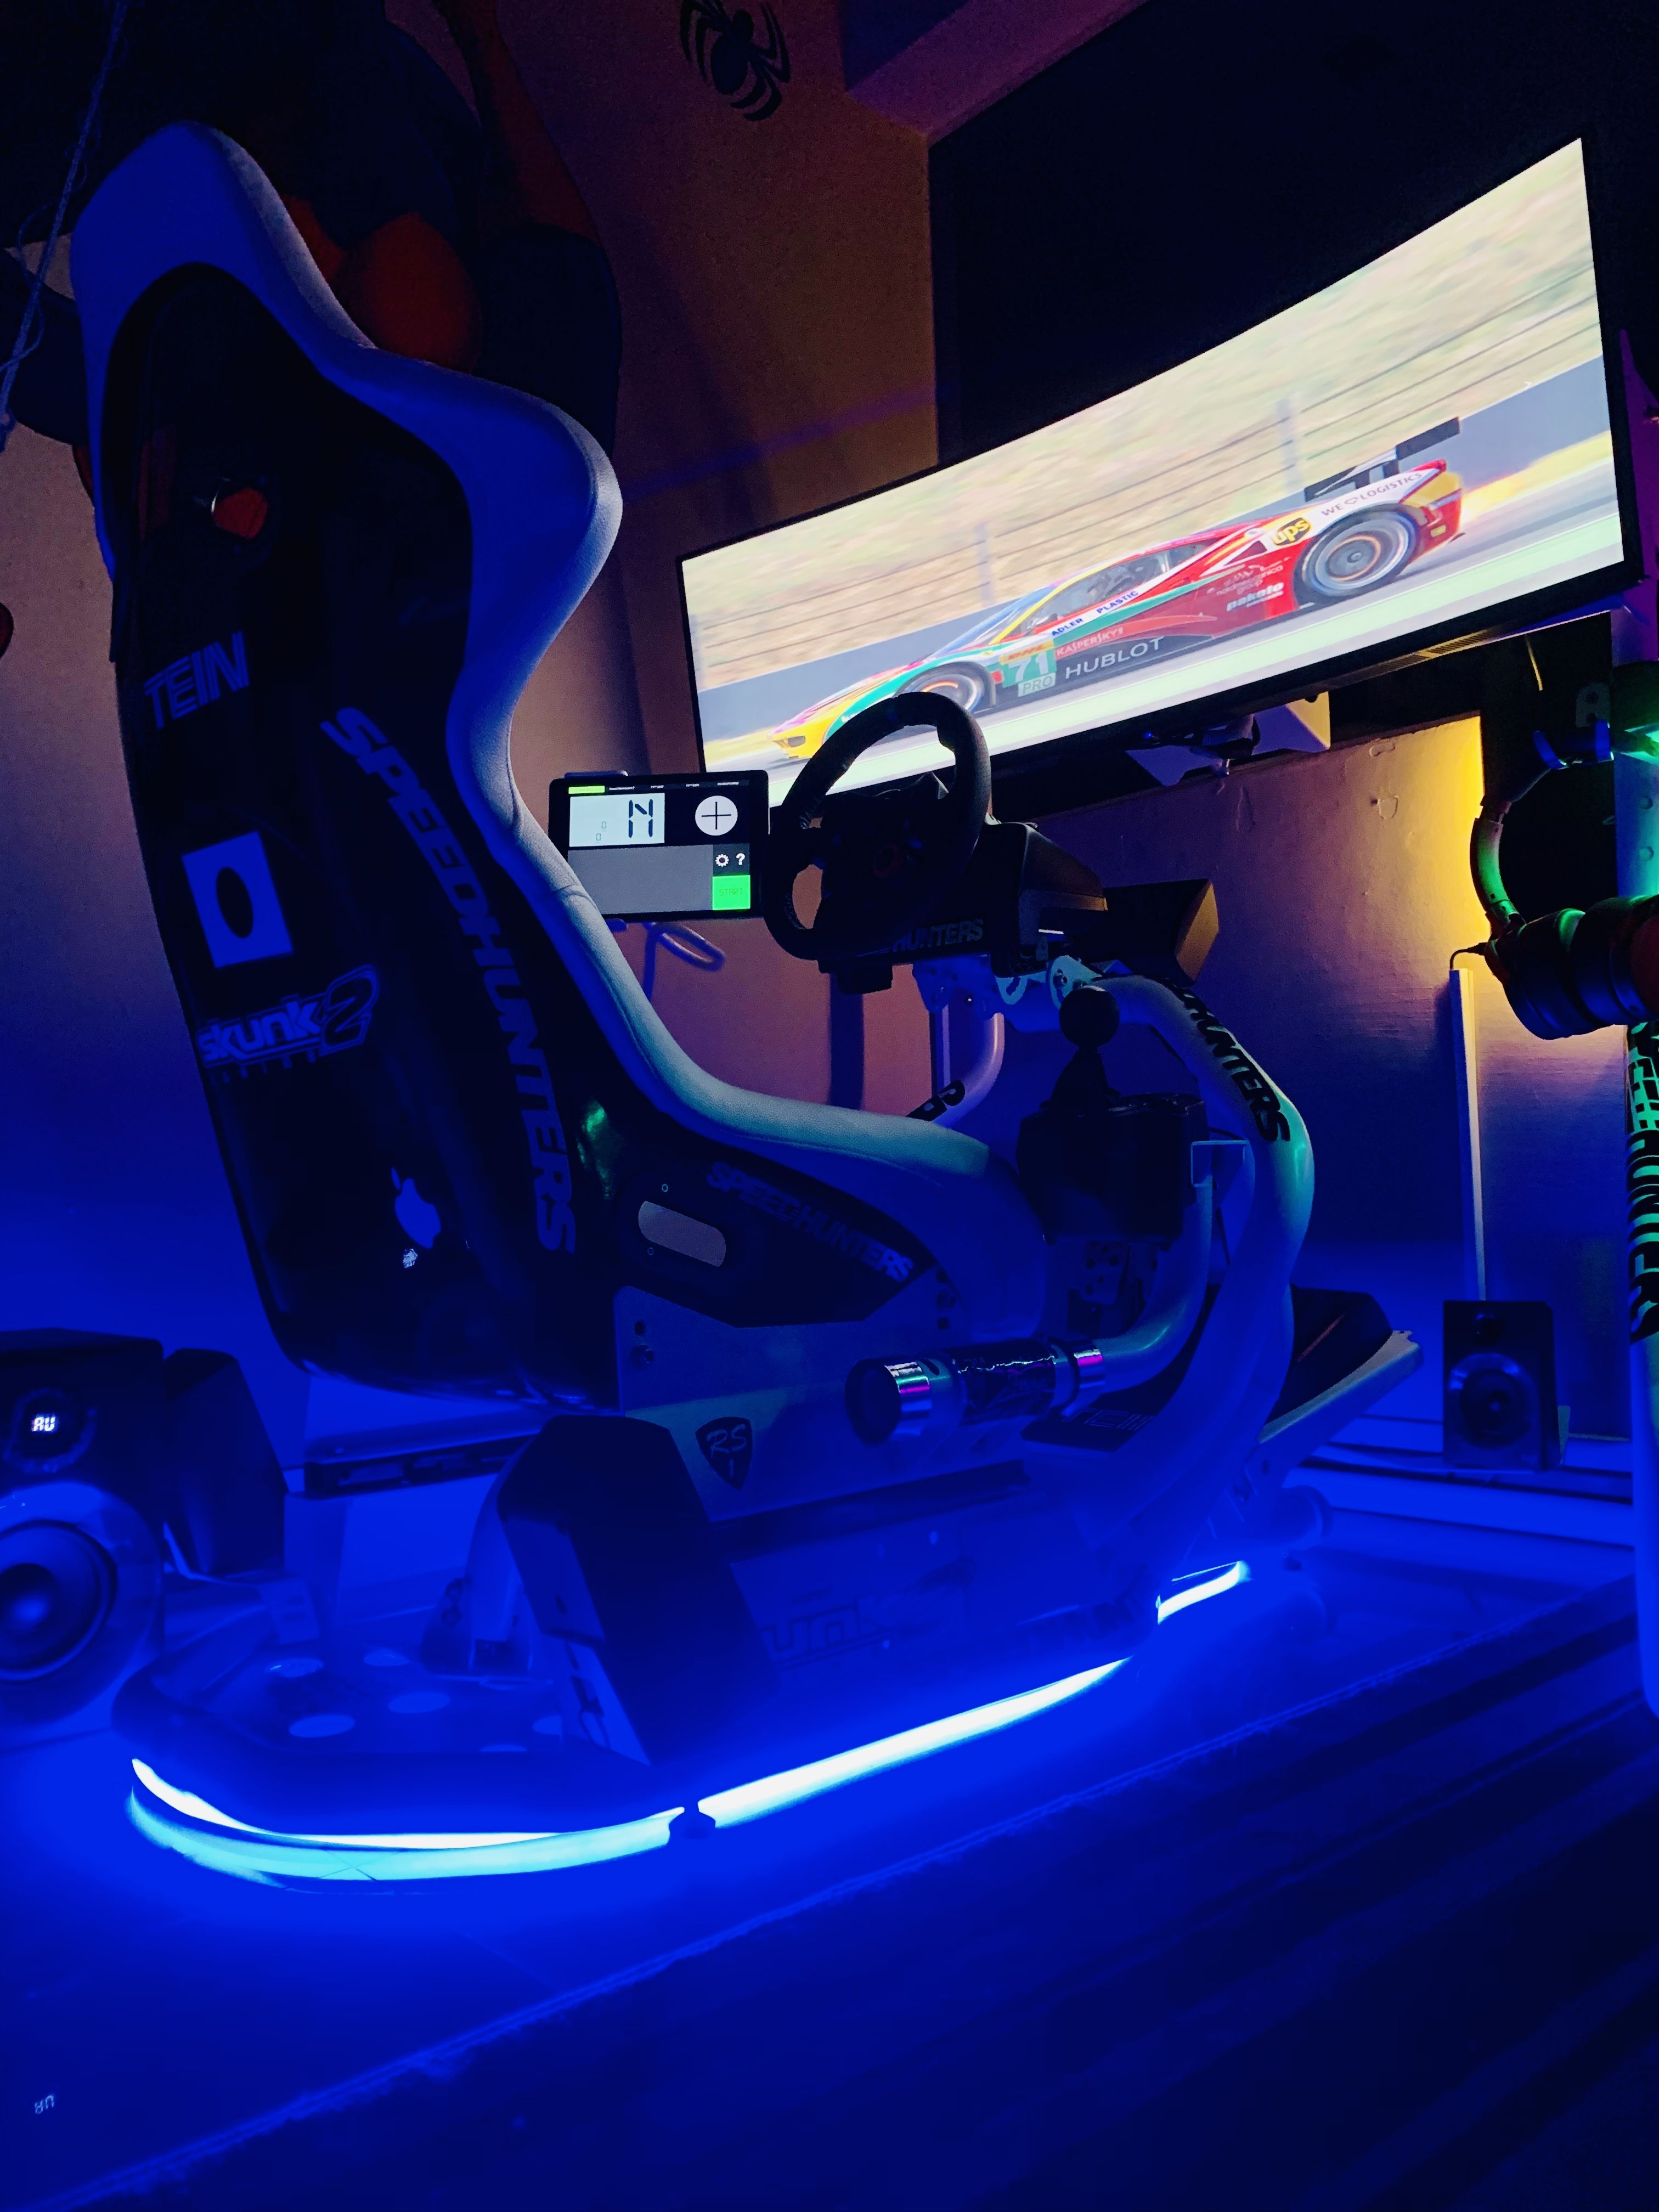 Rseat RS1 Racing simulator, Sims, Cockpit